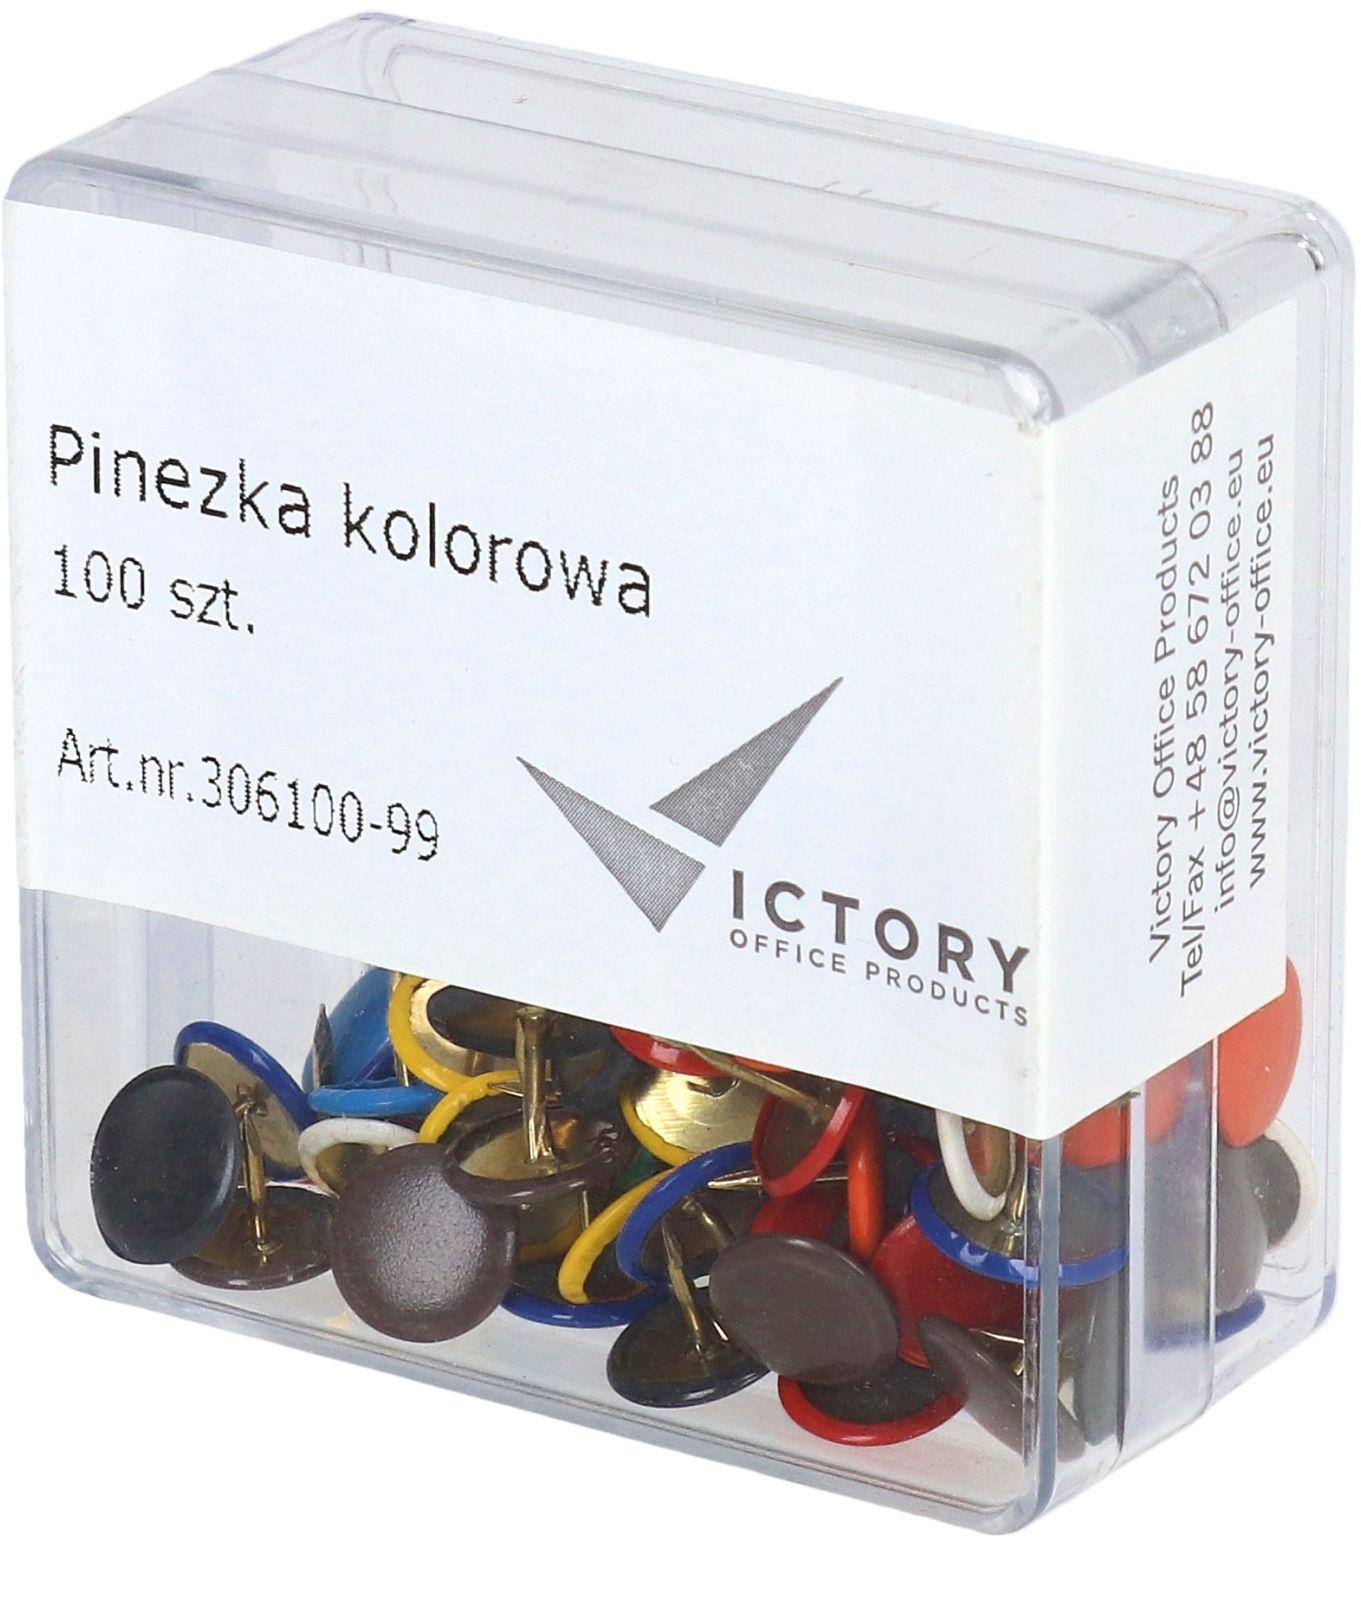 Pinezki kolor (100) pudełko Victory Office